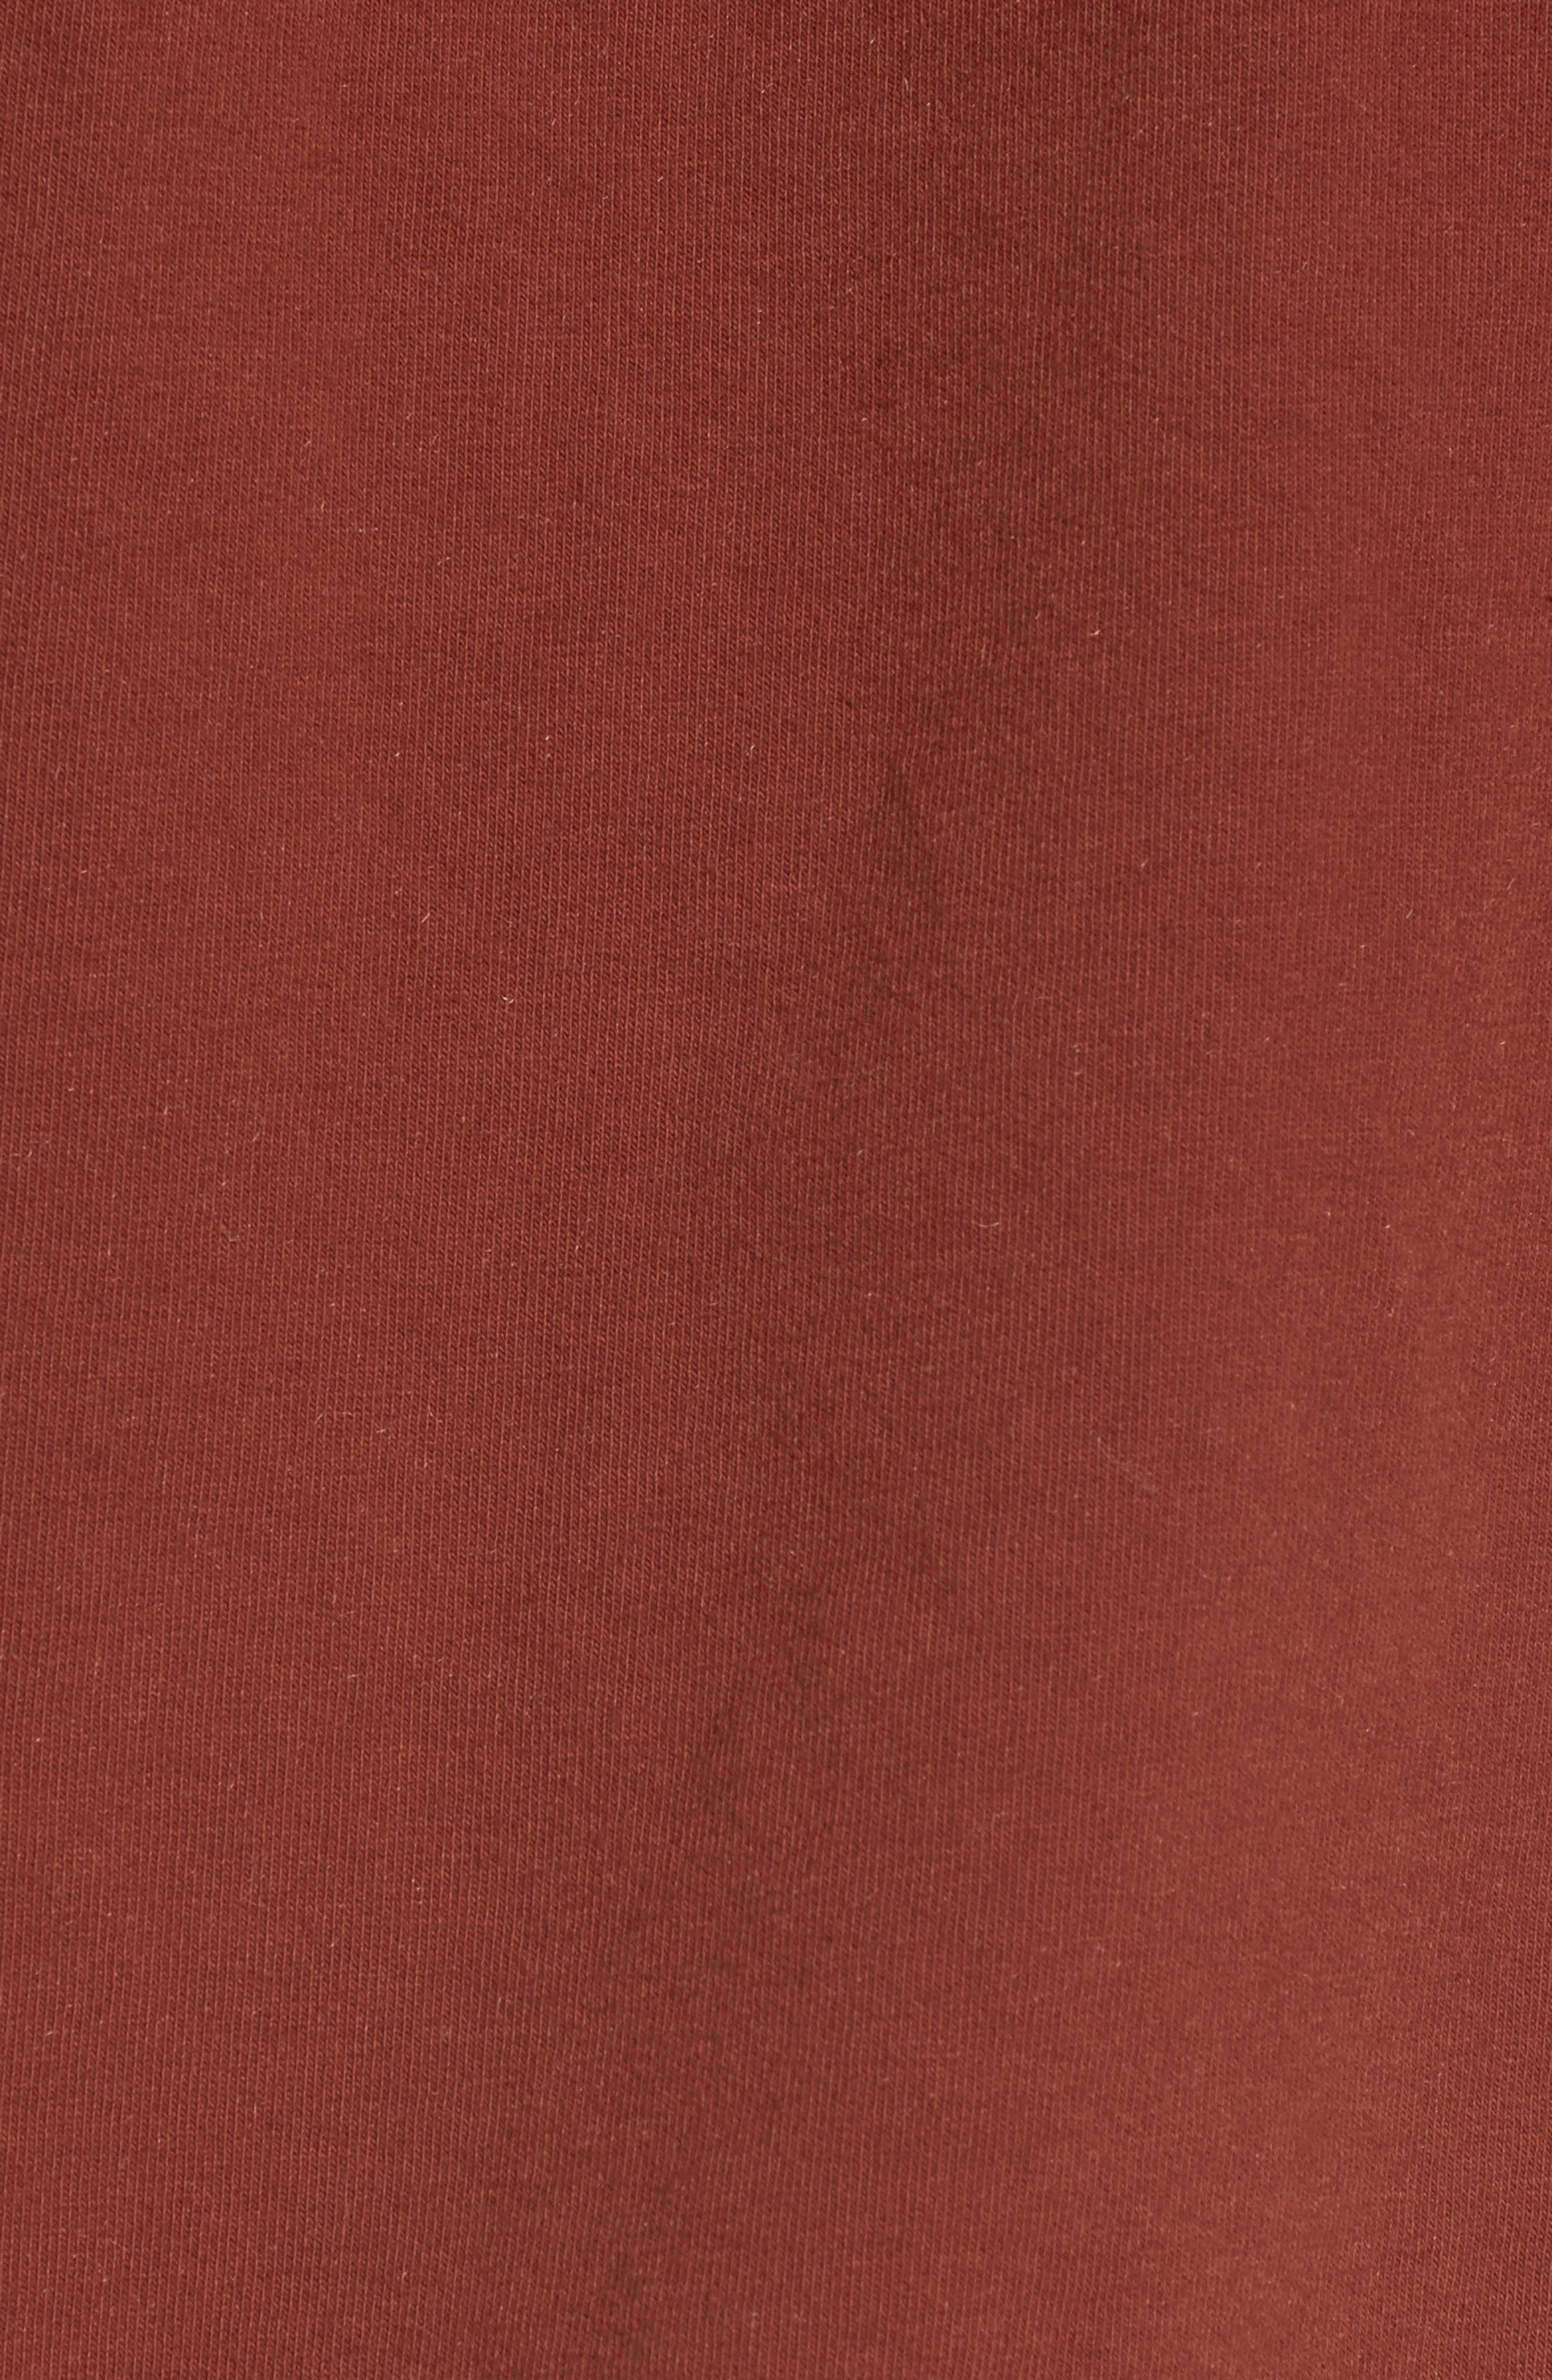 Infinity Knot Sweatshirt,                             Alternate thumbnail 5, color,                             Marsala